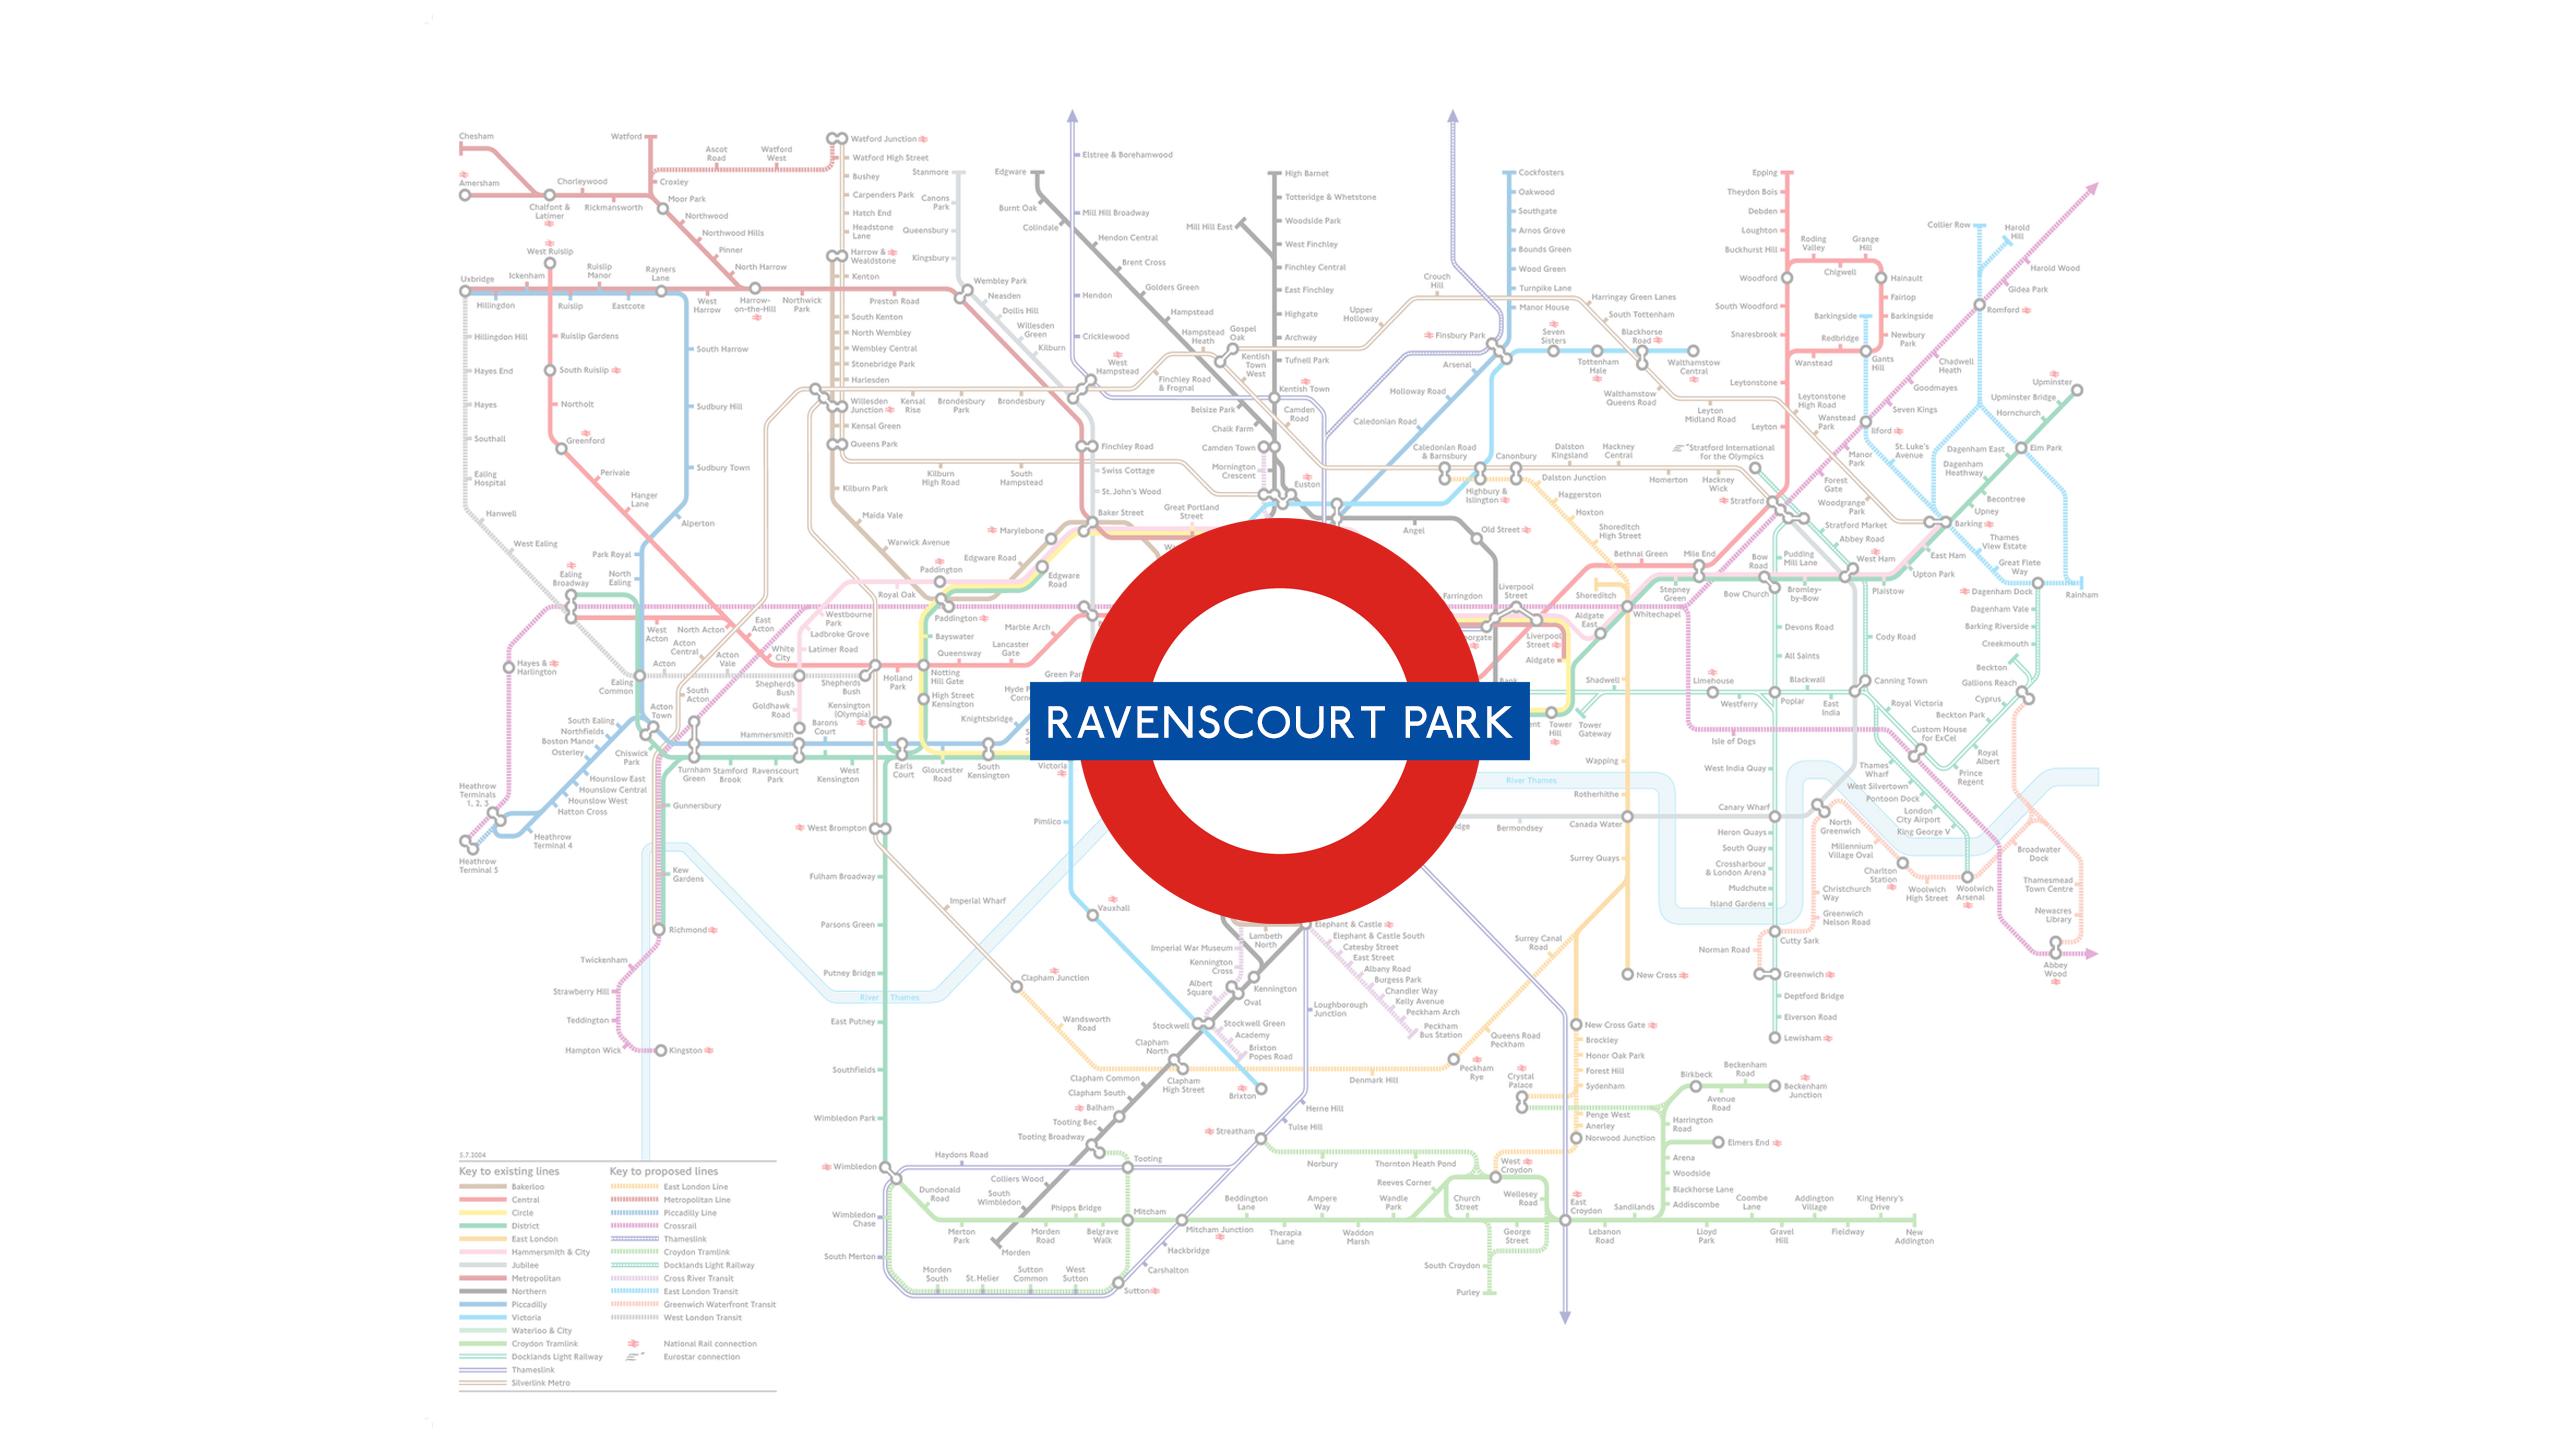 Ravenscourt Park (Map)